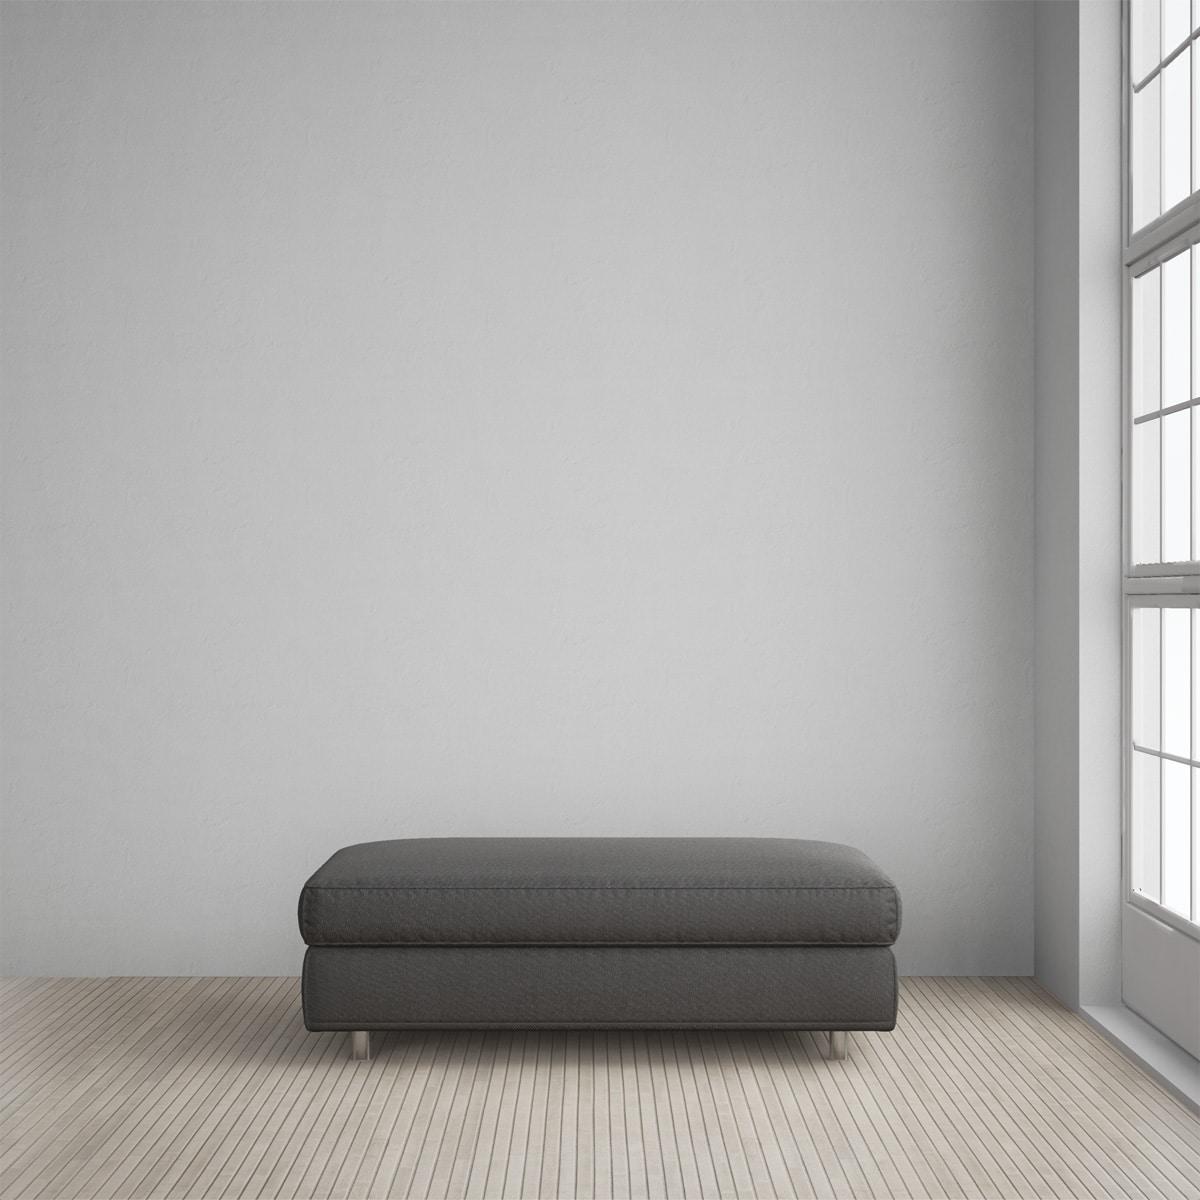 cassina mister sofa module 07 ue4arch. Black Bedroom Furniture Sets. Home Design Ideas